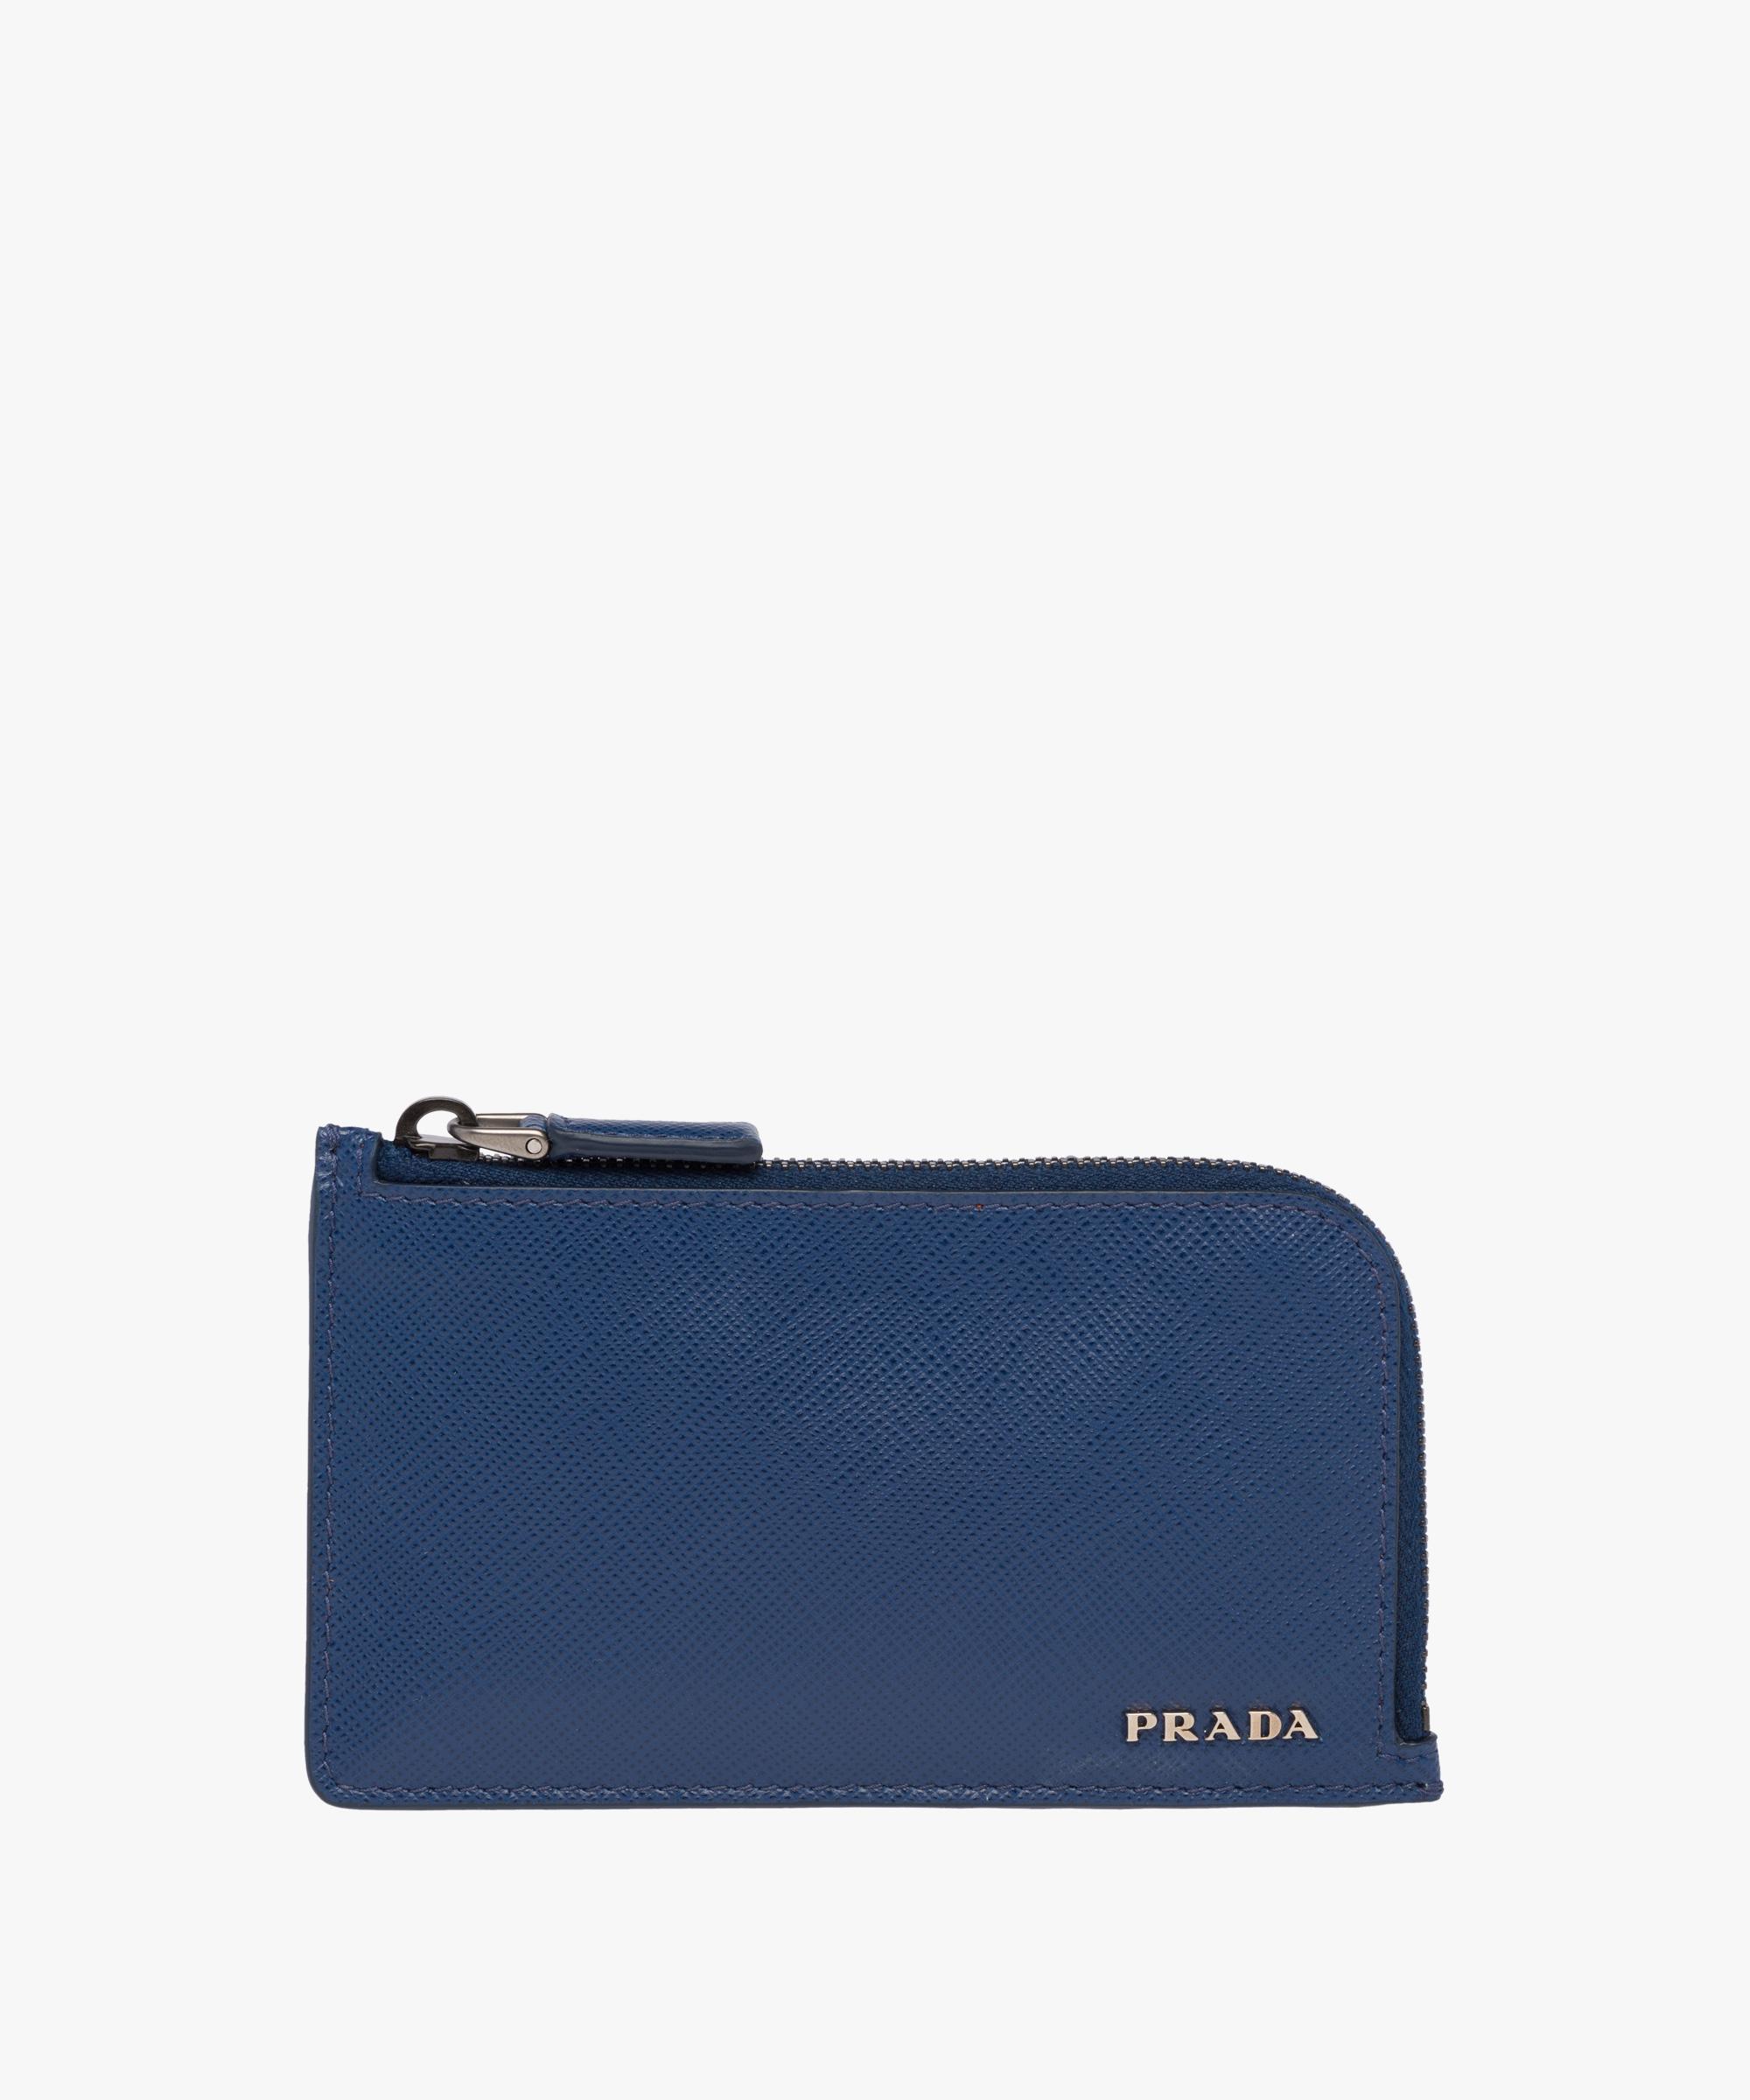 a5855e526c32 ... new arrivals saffiano leather card holder prada cornflower blue papaya  0429a 28917 ...